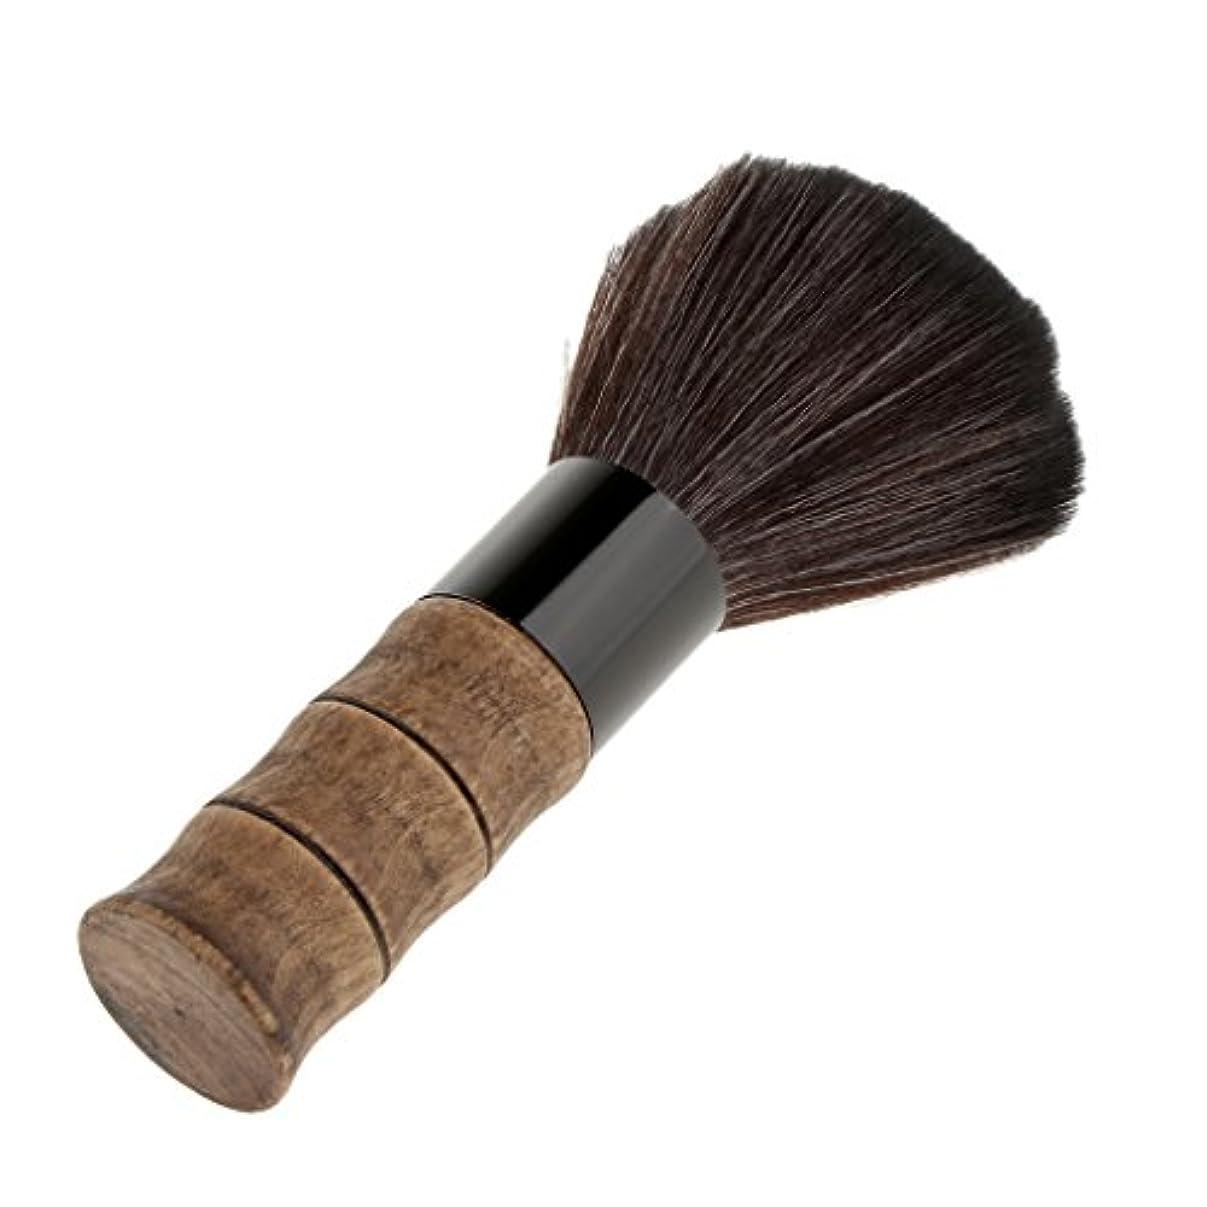 Baosity ブラシ シェービングブラシ メイクブラシ ソフト 超柔らかい 繊維 洗顔 木製ハンドル 泡立ち 2色選べる  - ブラック